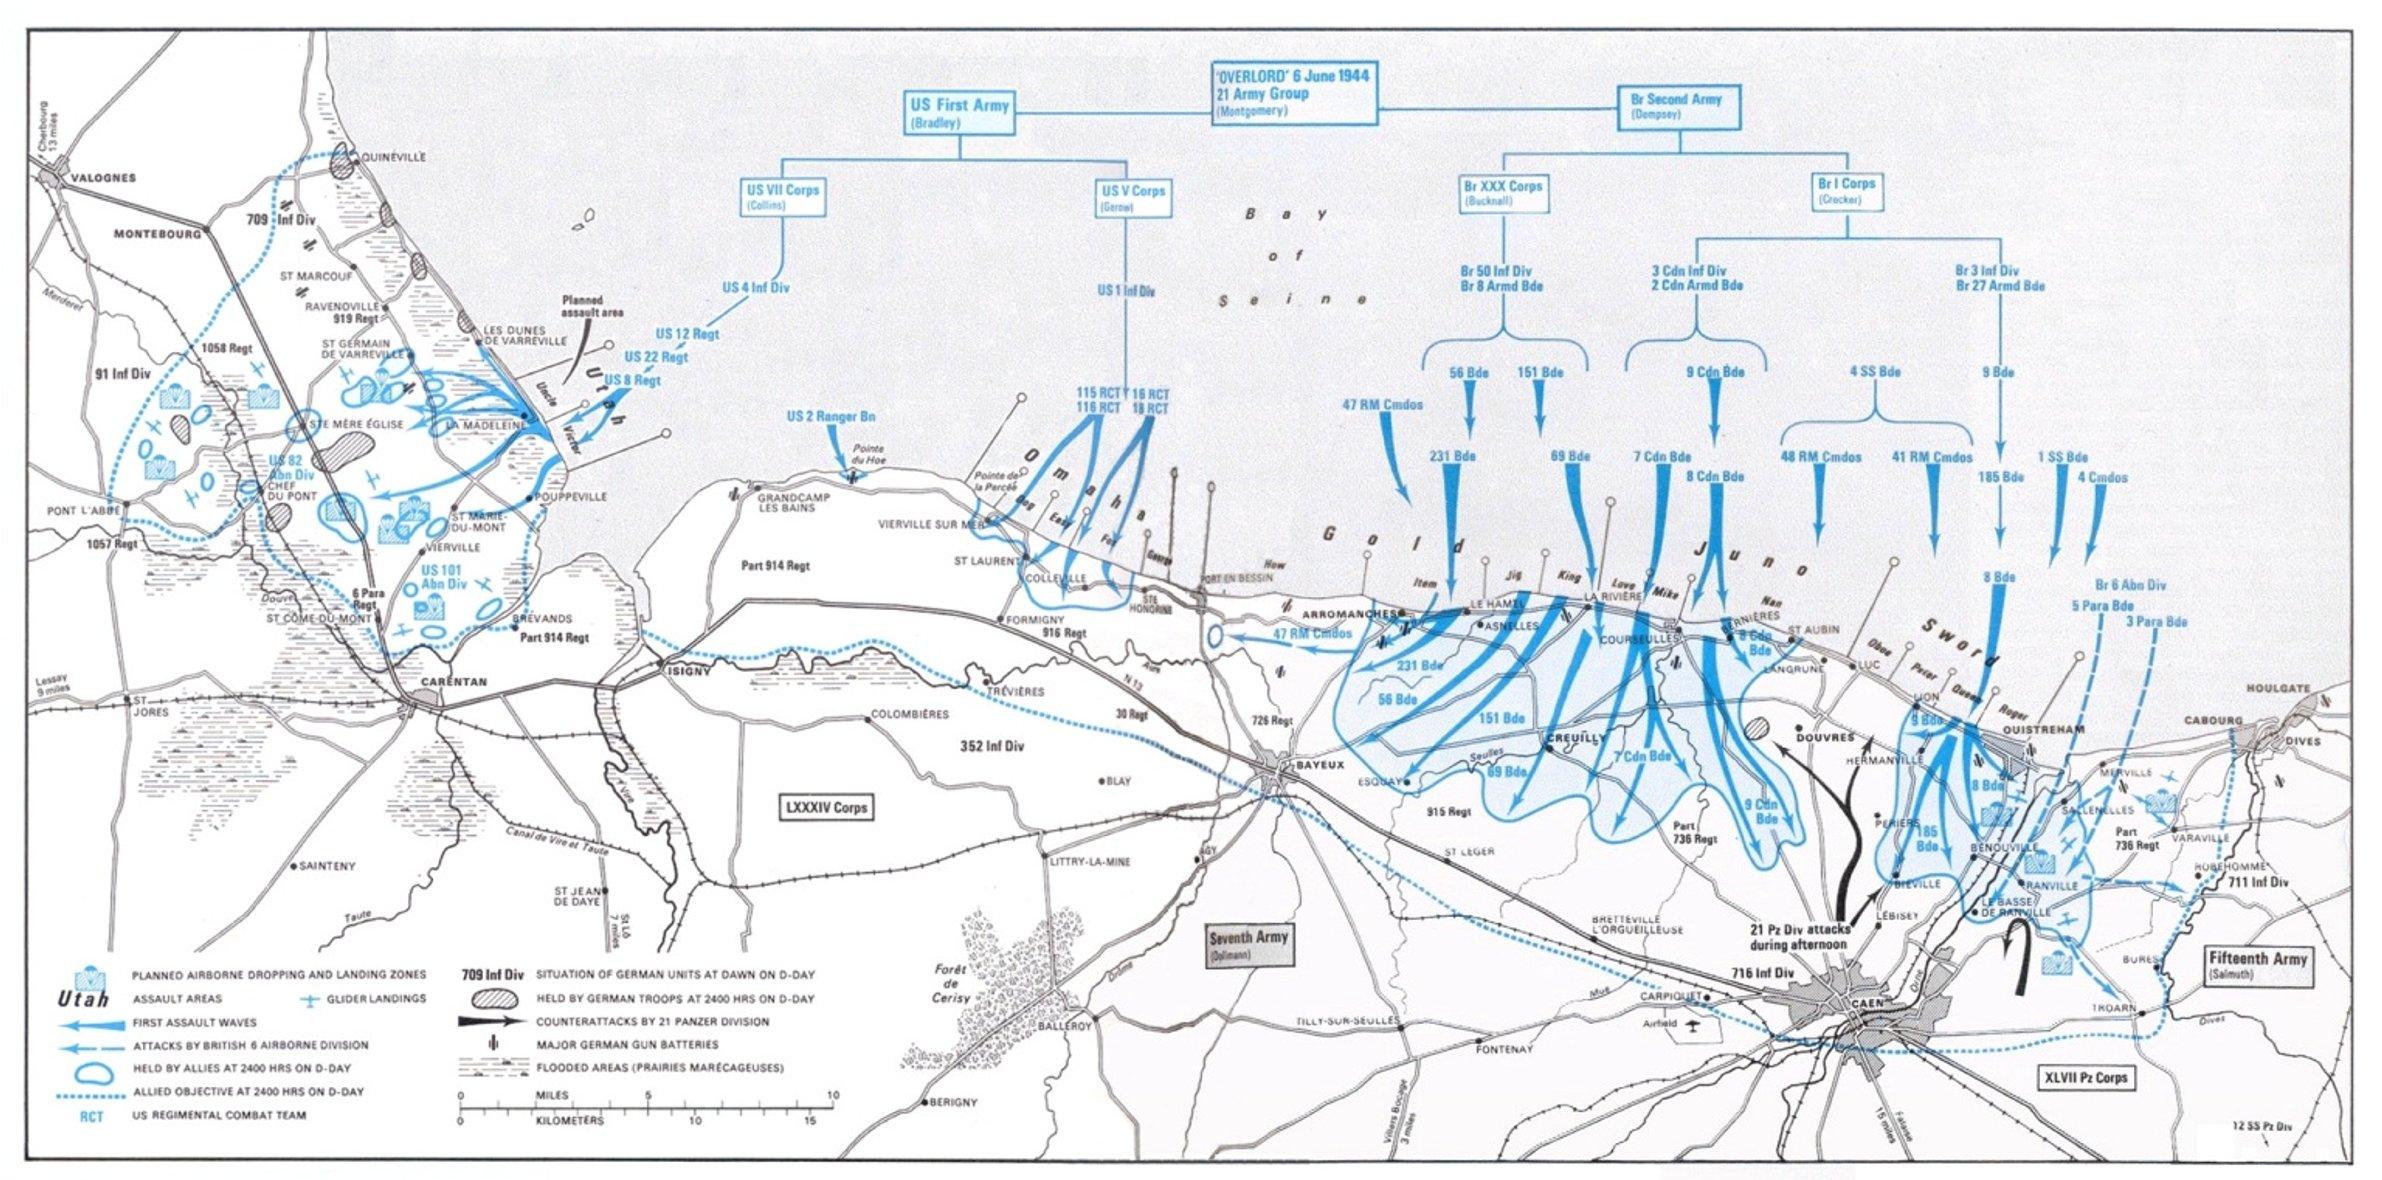 Operation Overlord World War 2 Maps Cka